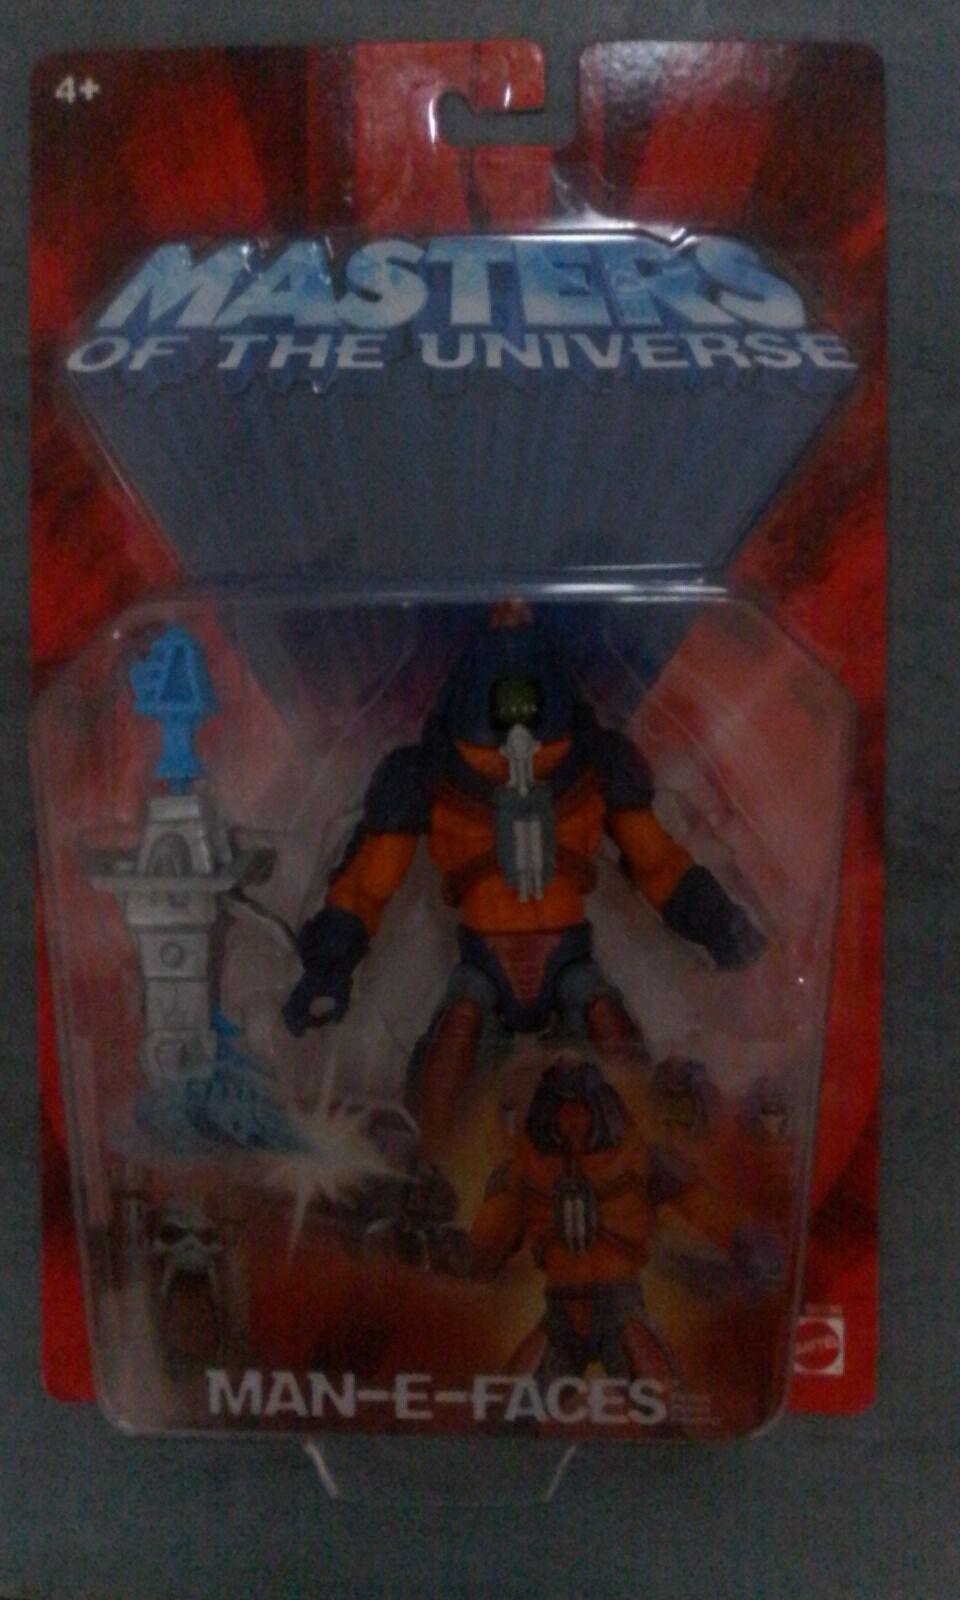 MATTEL MOTU Man-E-Faces HE-MAN Masters Universe MINT on Card. MOC Man E  Faces